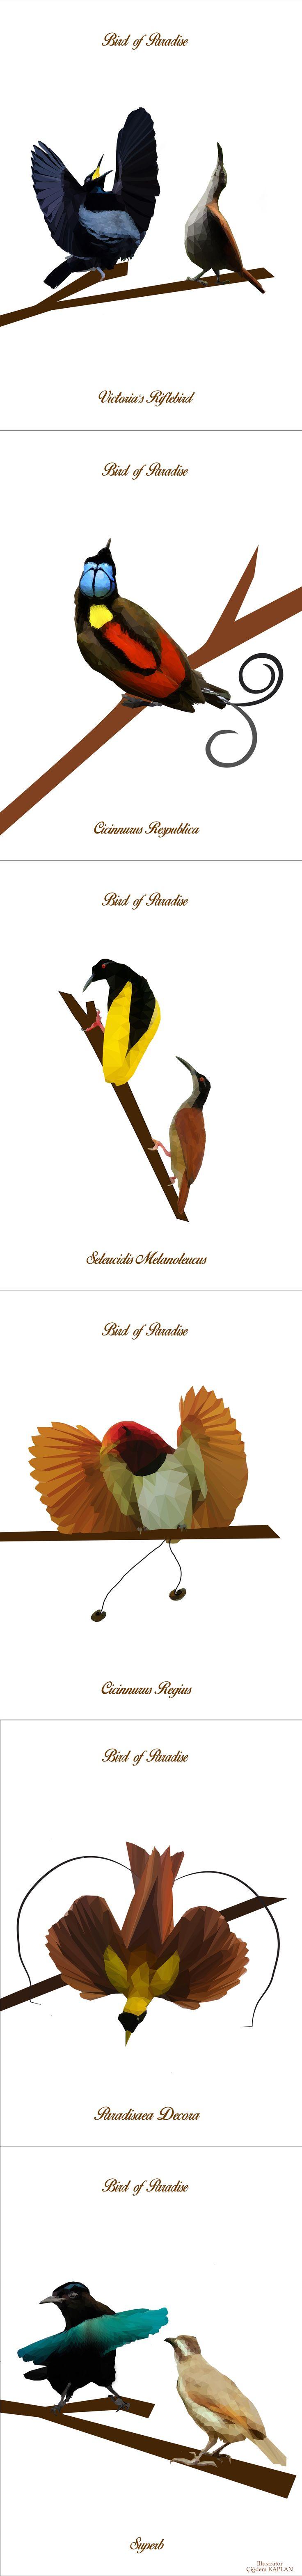 #proje #kuş #cennetkuşları #yenigineadası #tasarım #illüstrasyon #poligon #birds #drawing #polygon #illustration #graphicdesing #birdsofparadise #nationalgeoraphic #timlaman #edscholes #Papua #newguinea